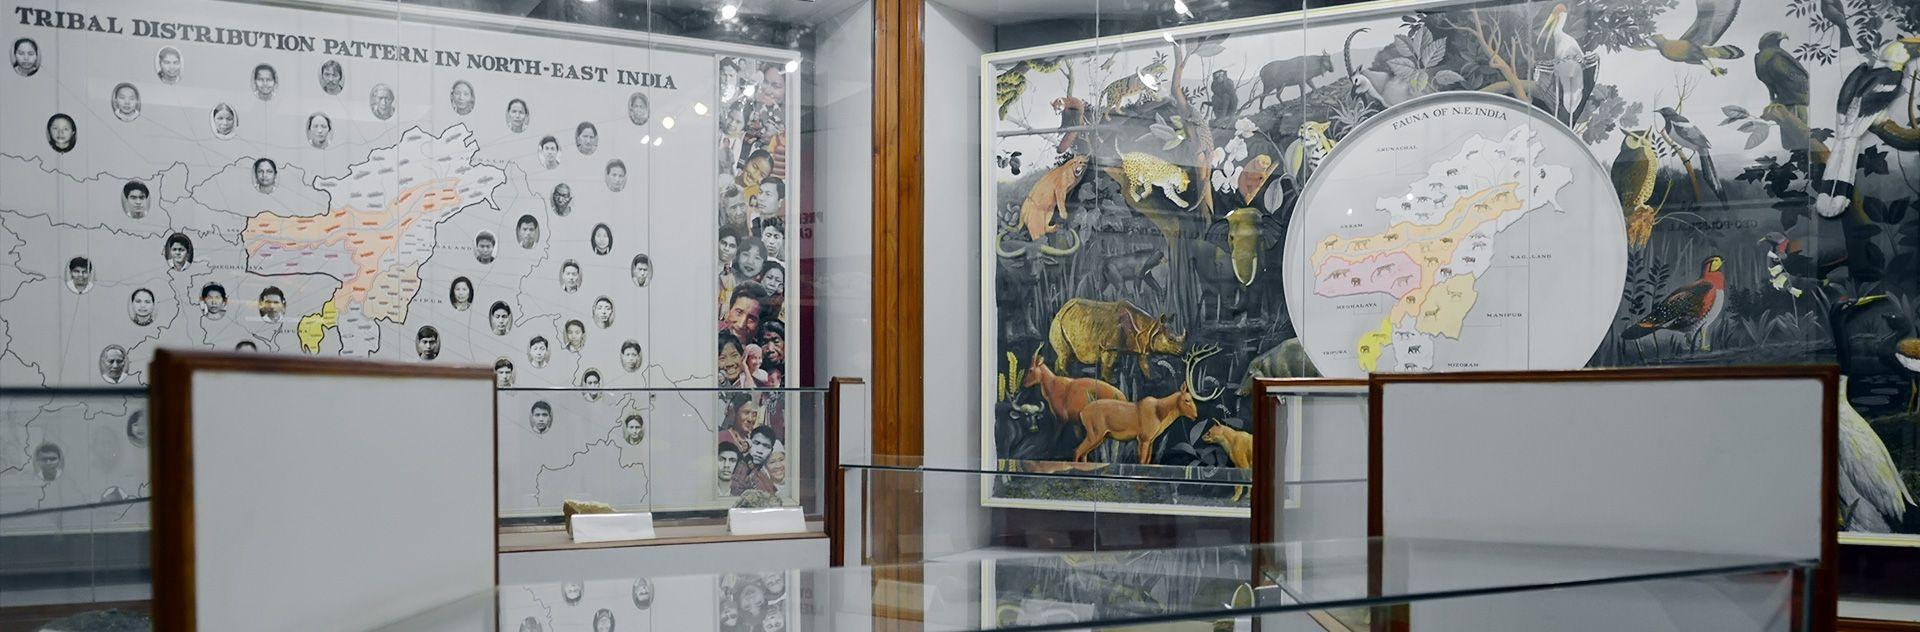 museum in meghalaya